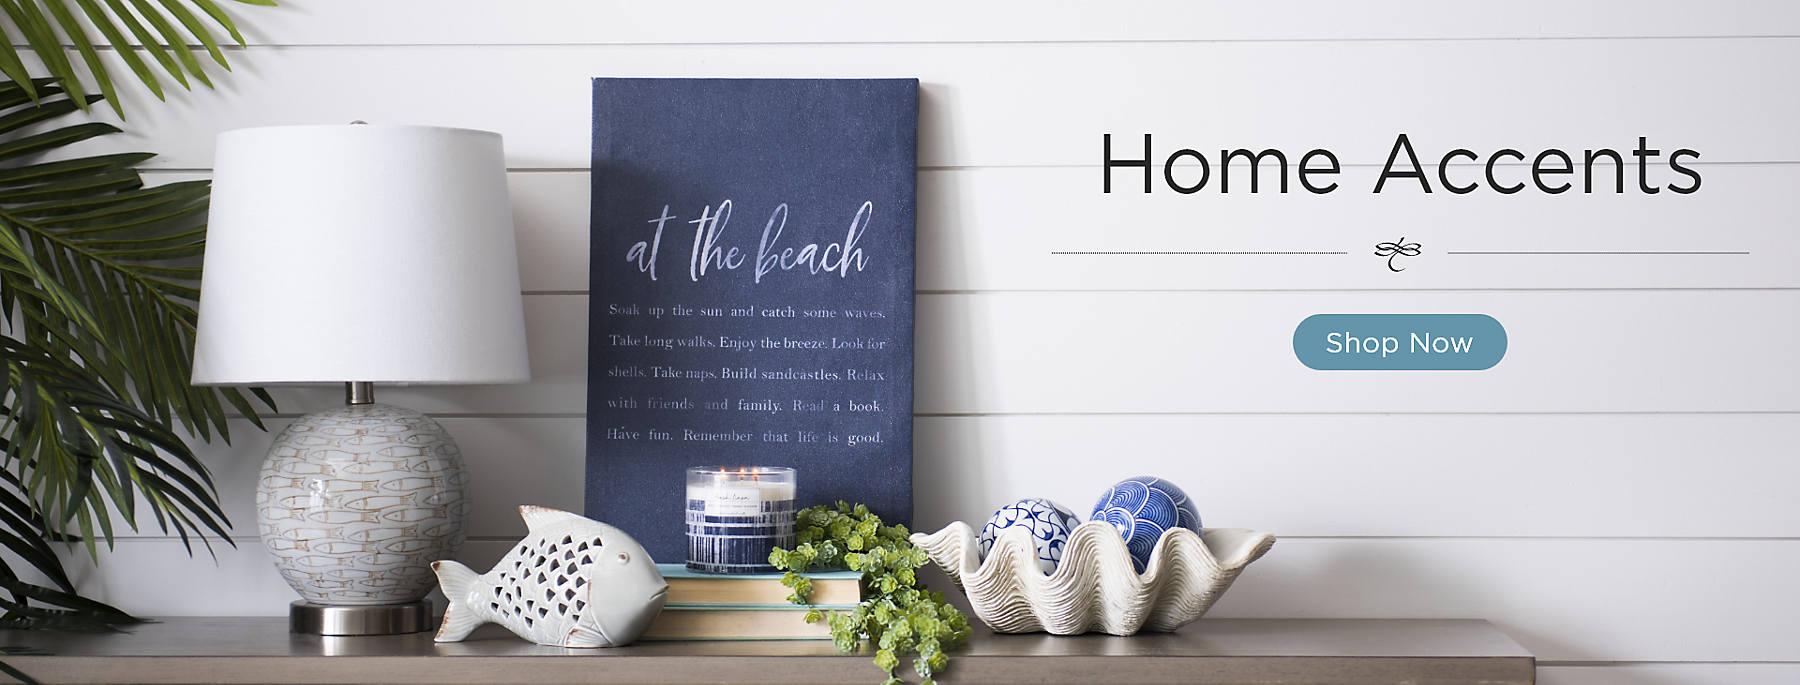 Home Accents Shop Now